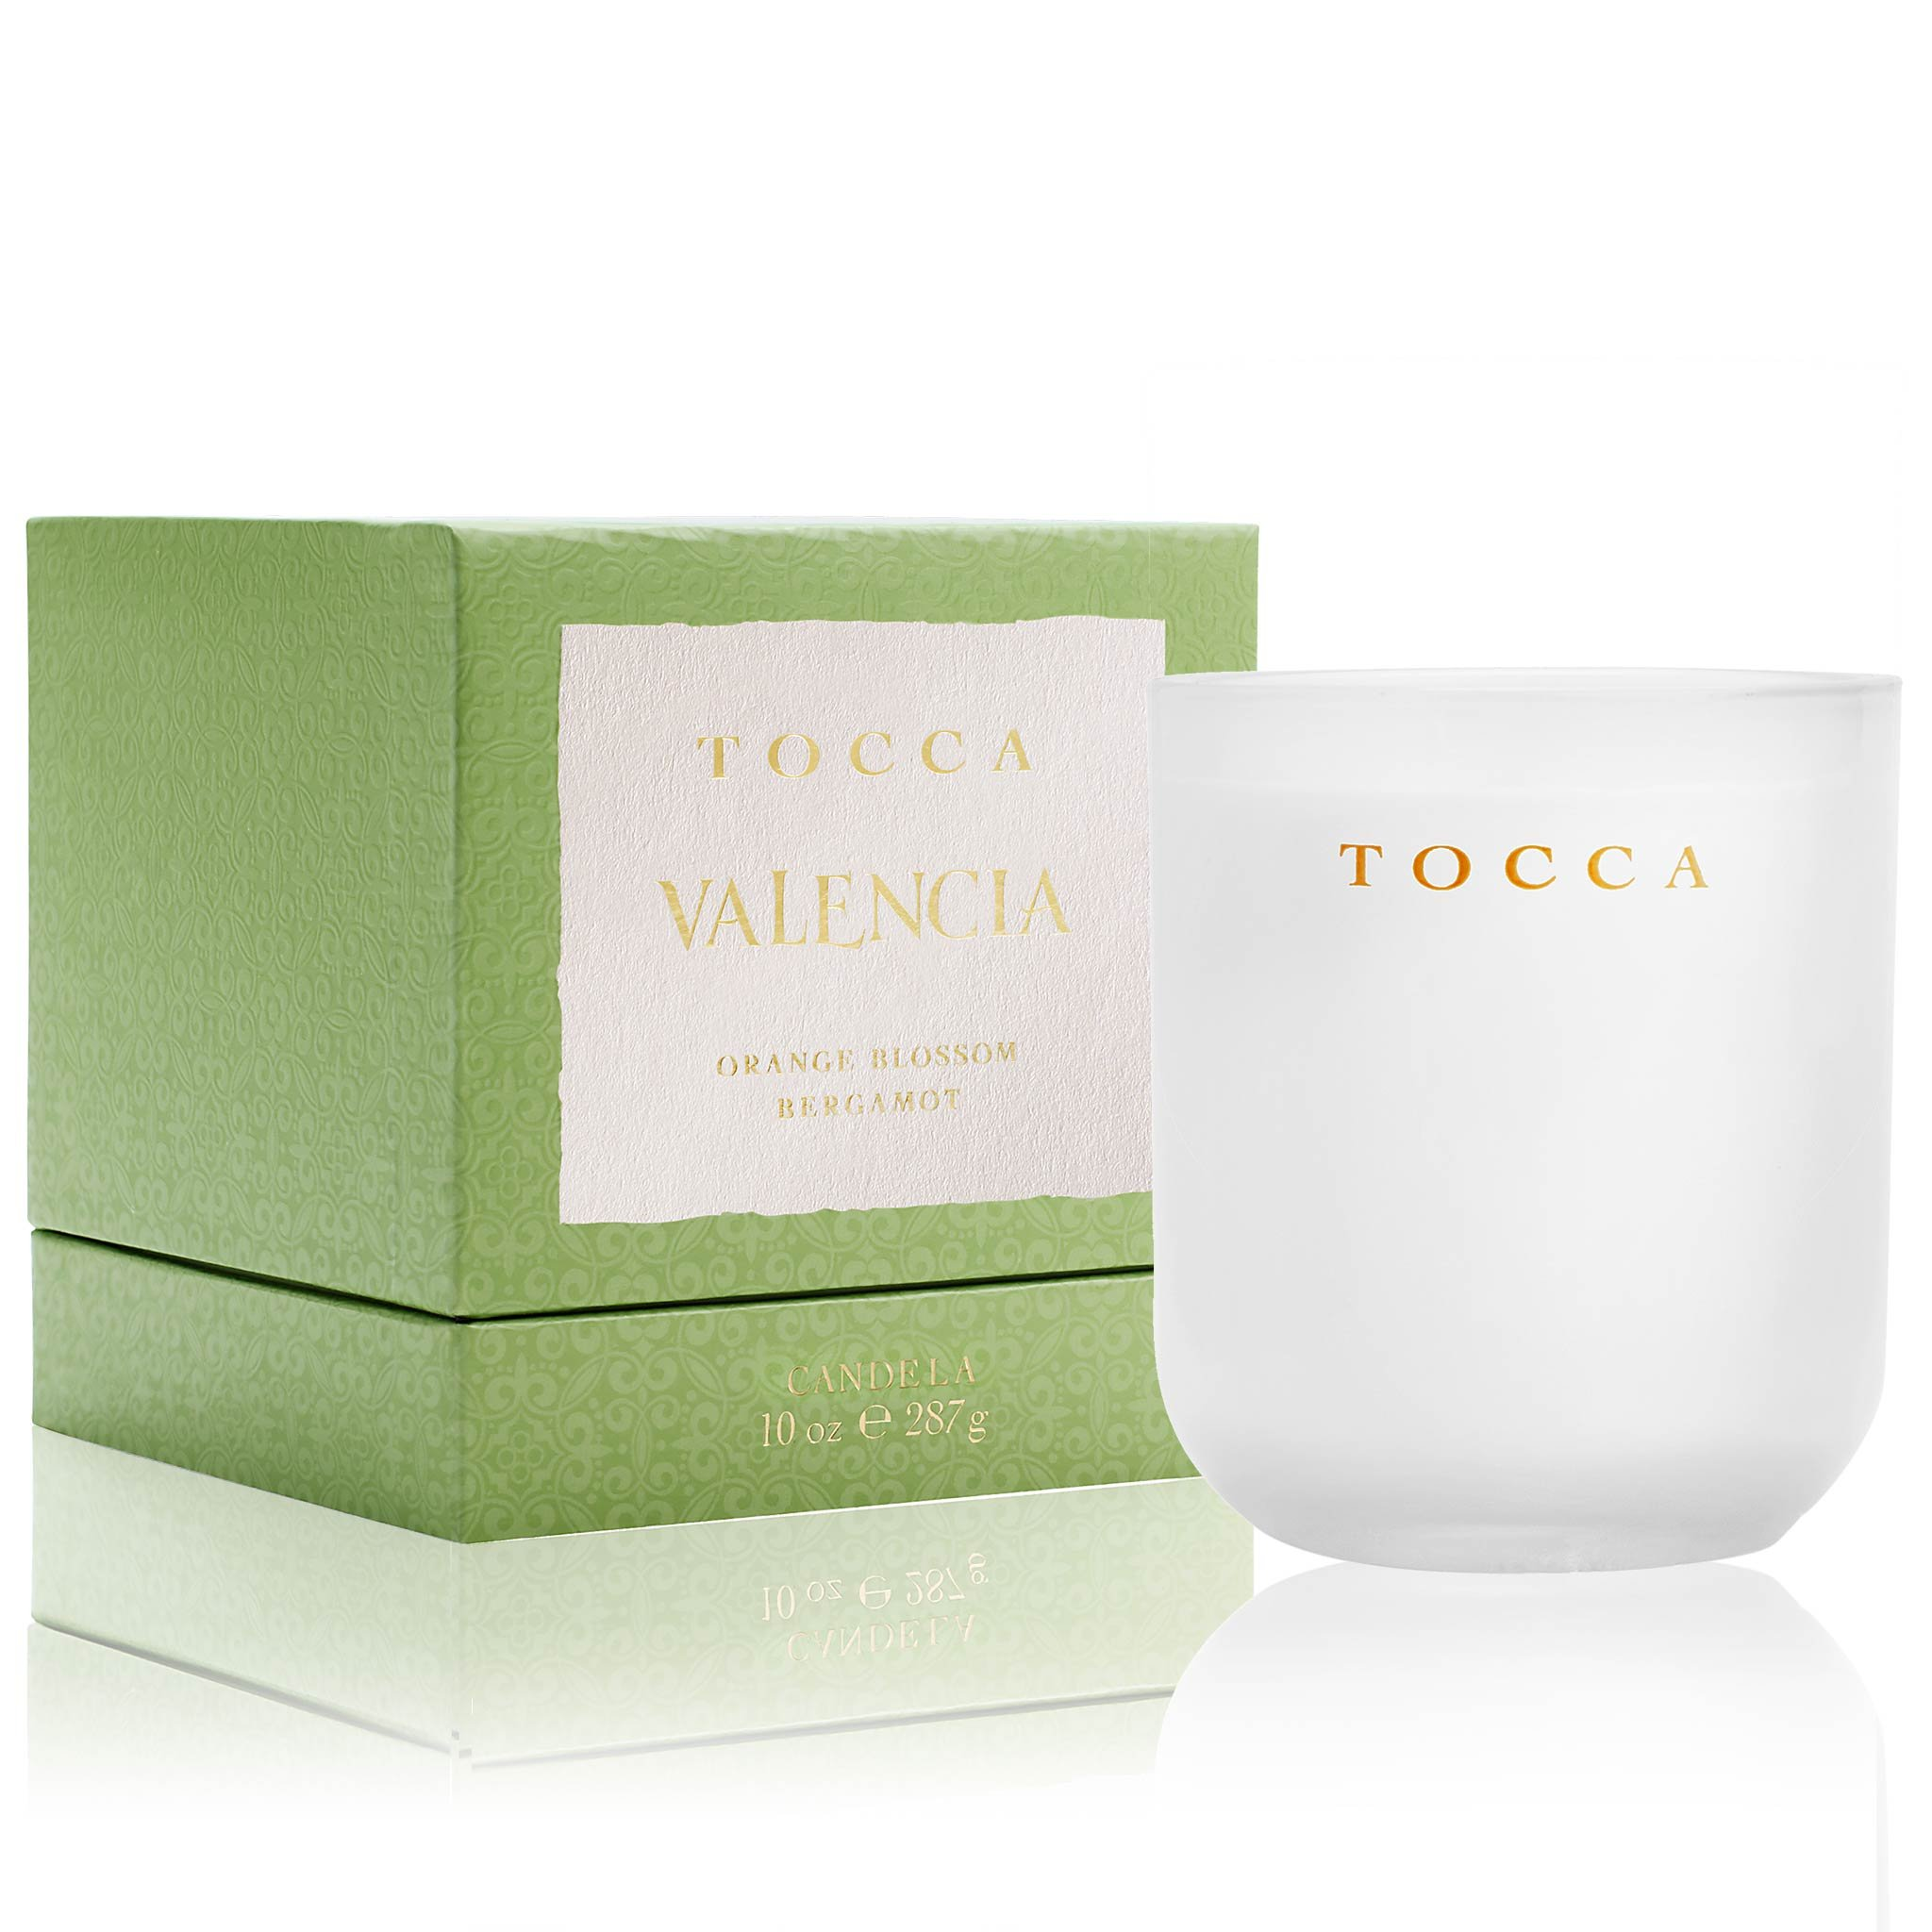 Tocca Valencia Orange Blossom & Bergamot Candle, 10 oz